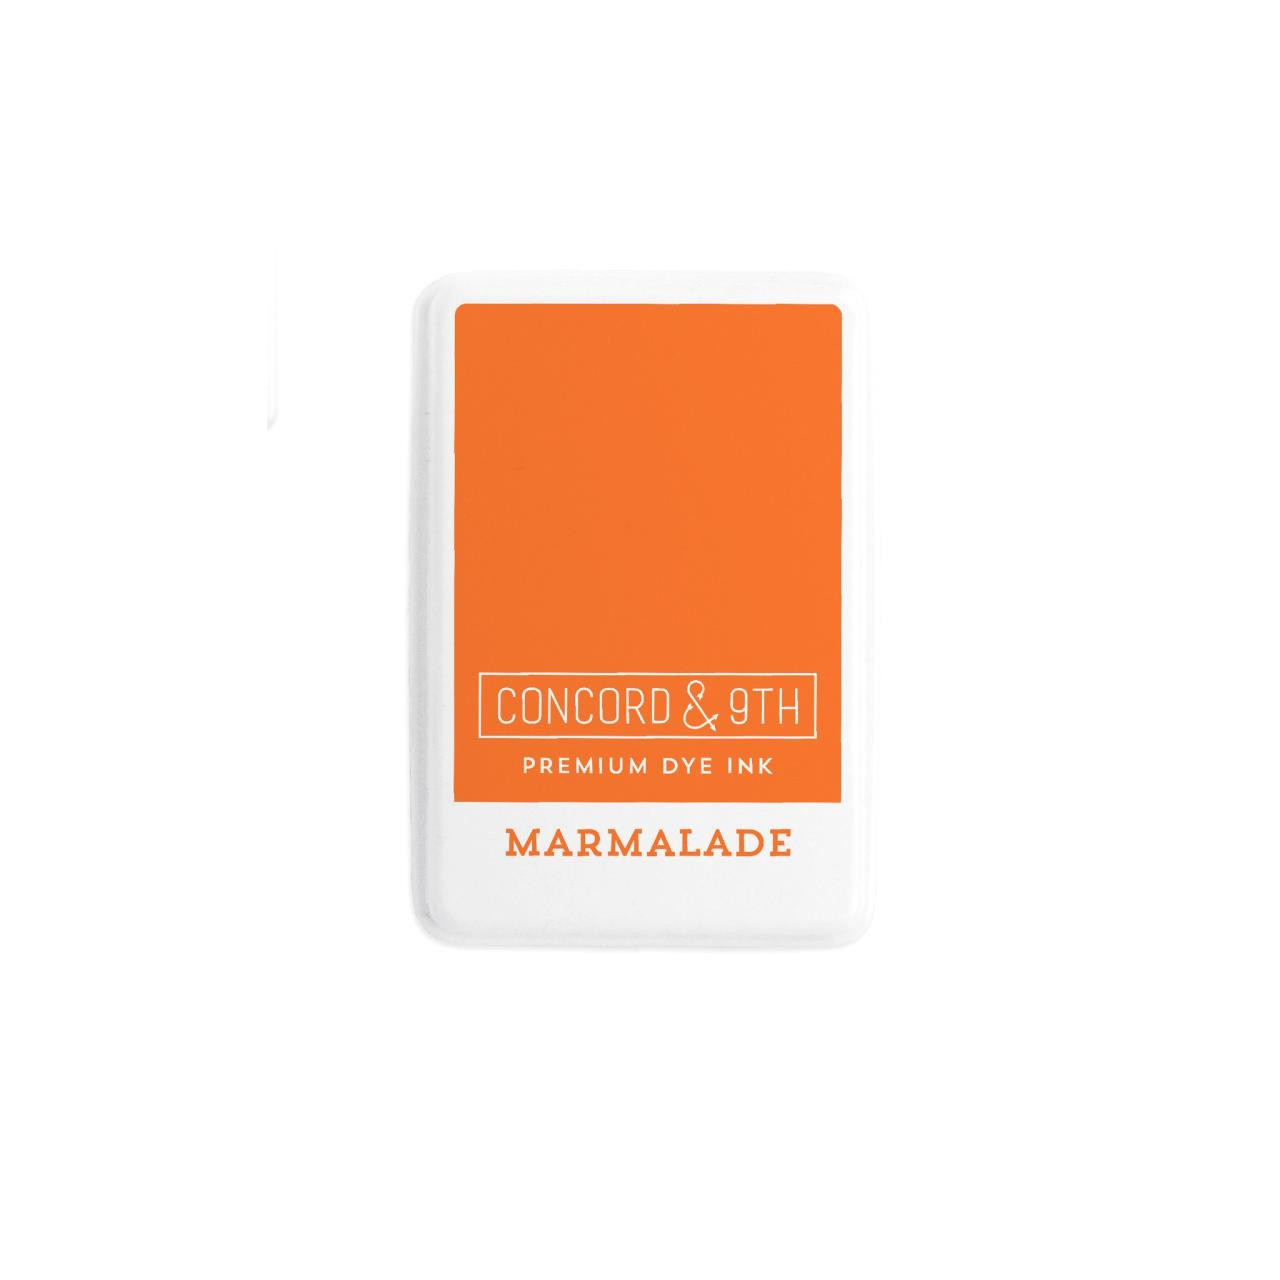 Marmalade, Concord & 9th Premium Dye Ink Pads - 090222401952